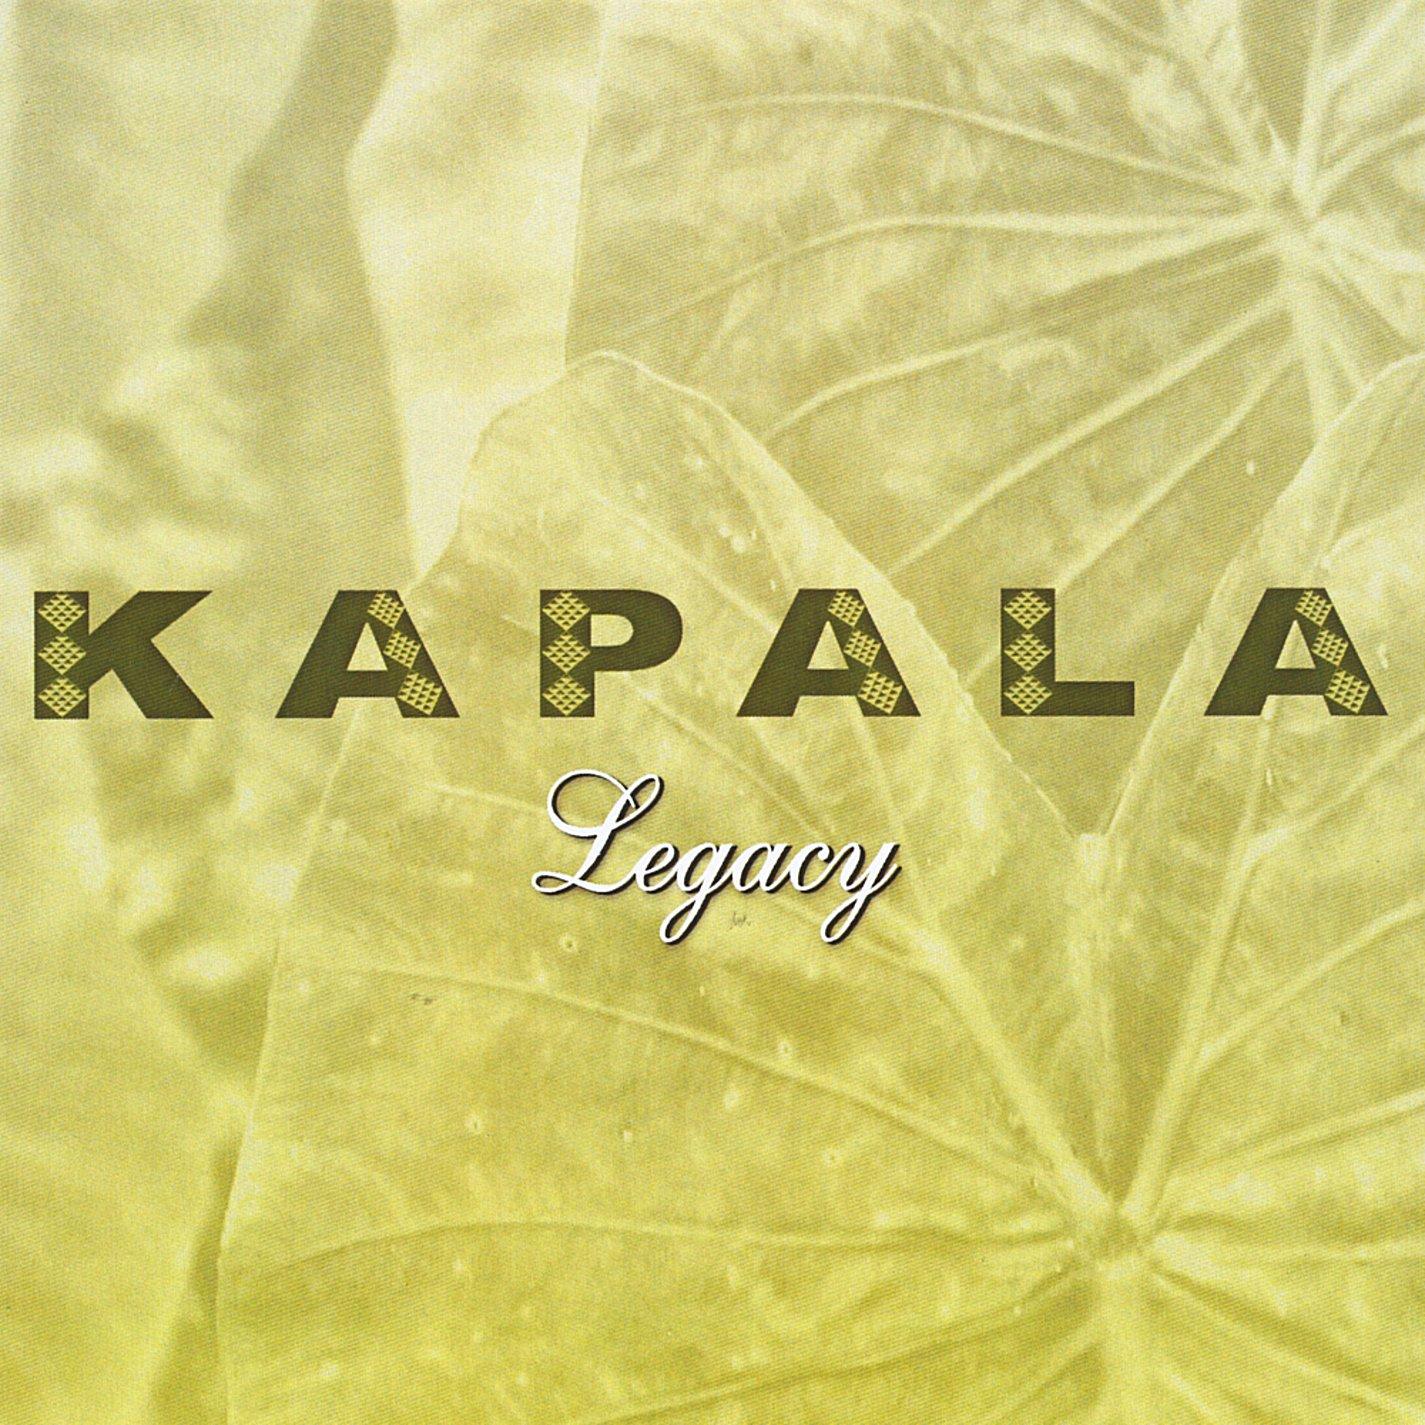 Kapala - Legacy album cover